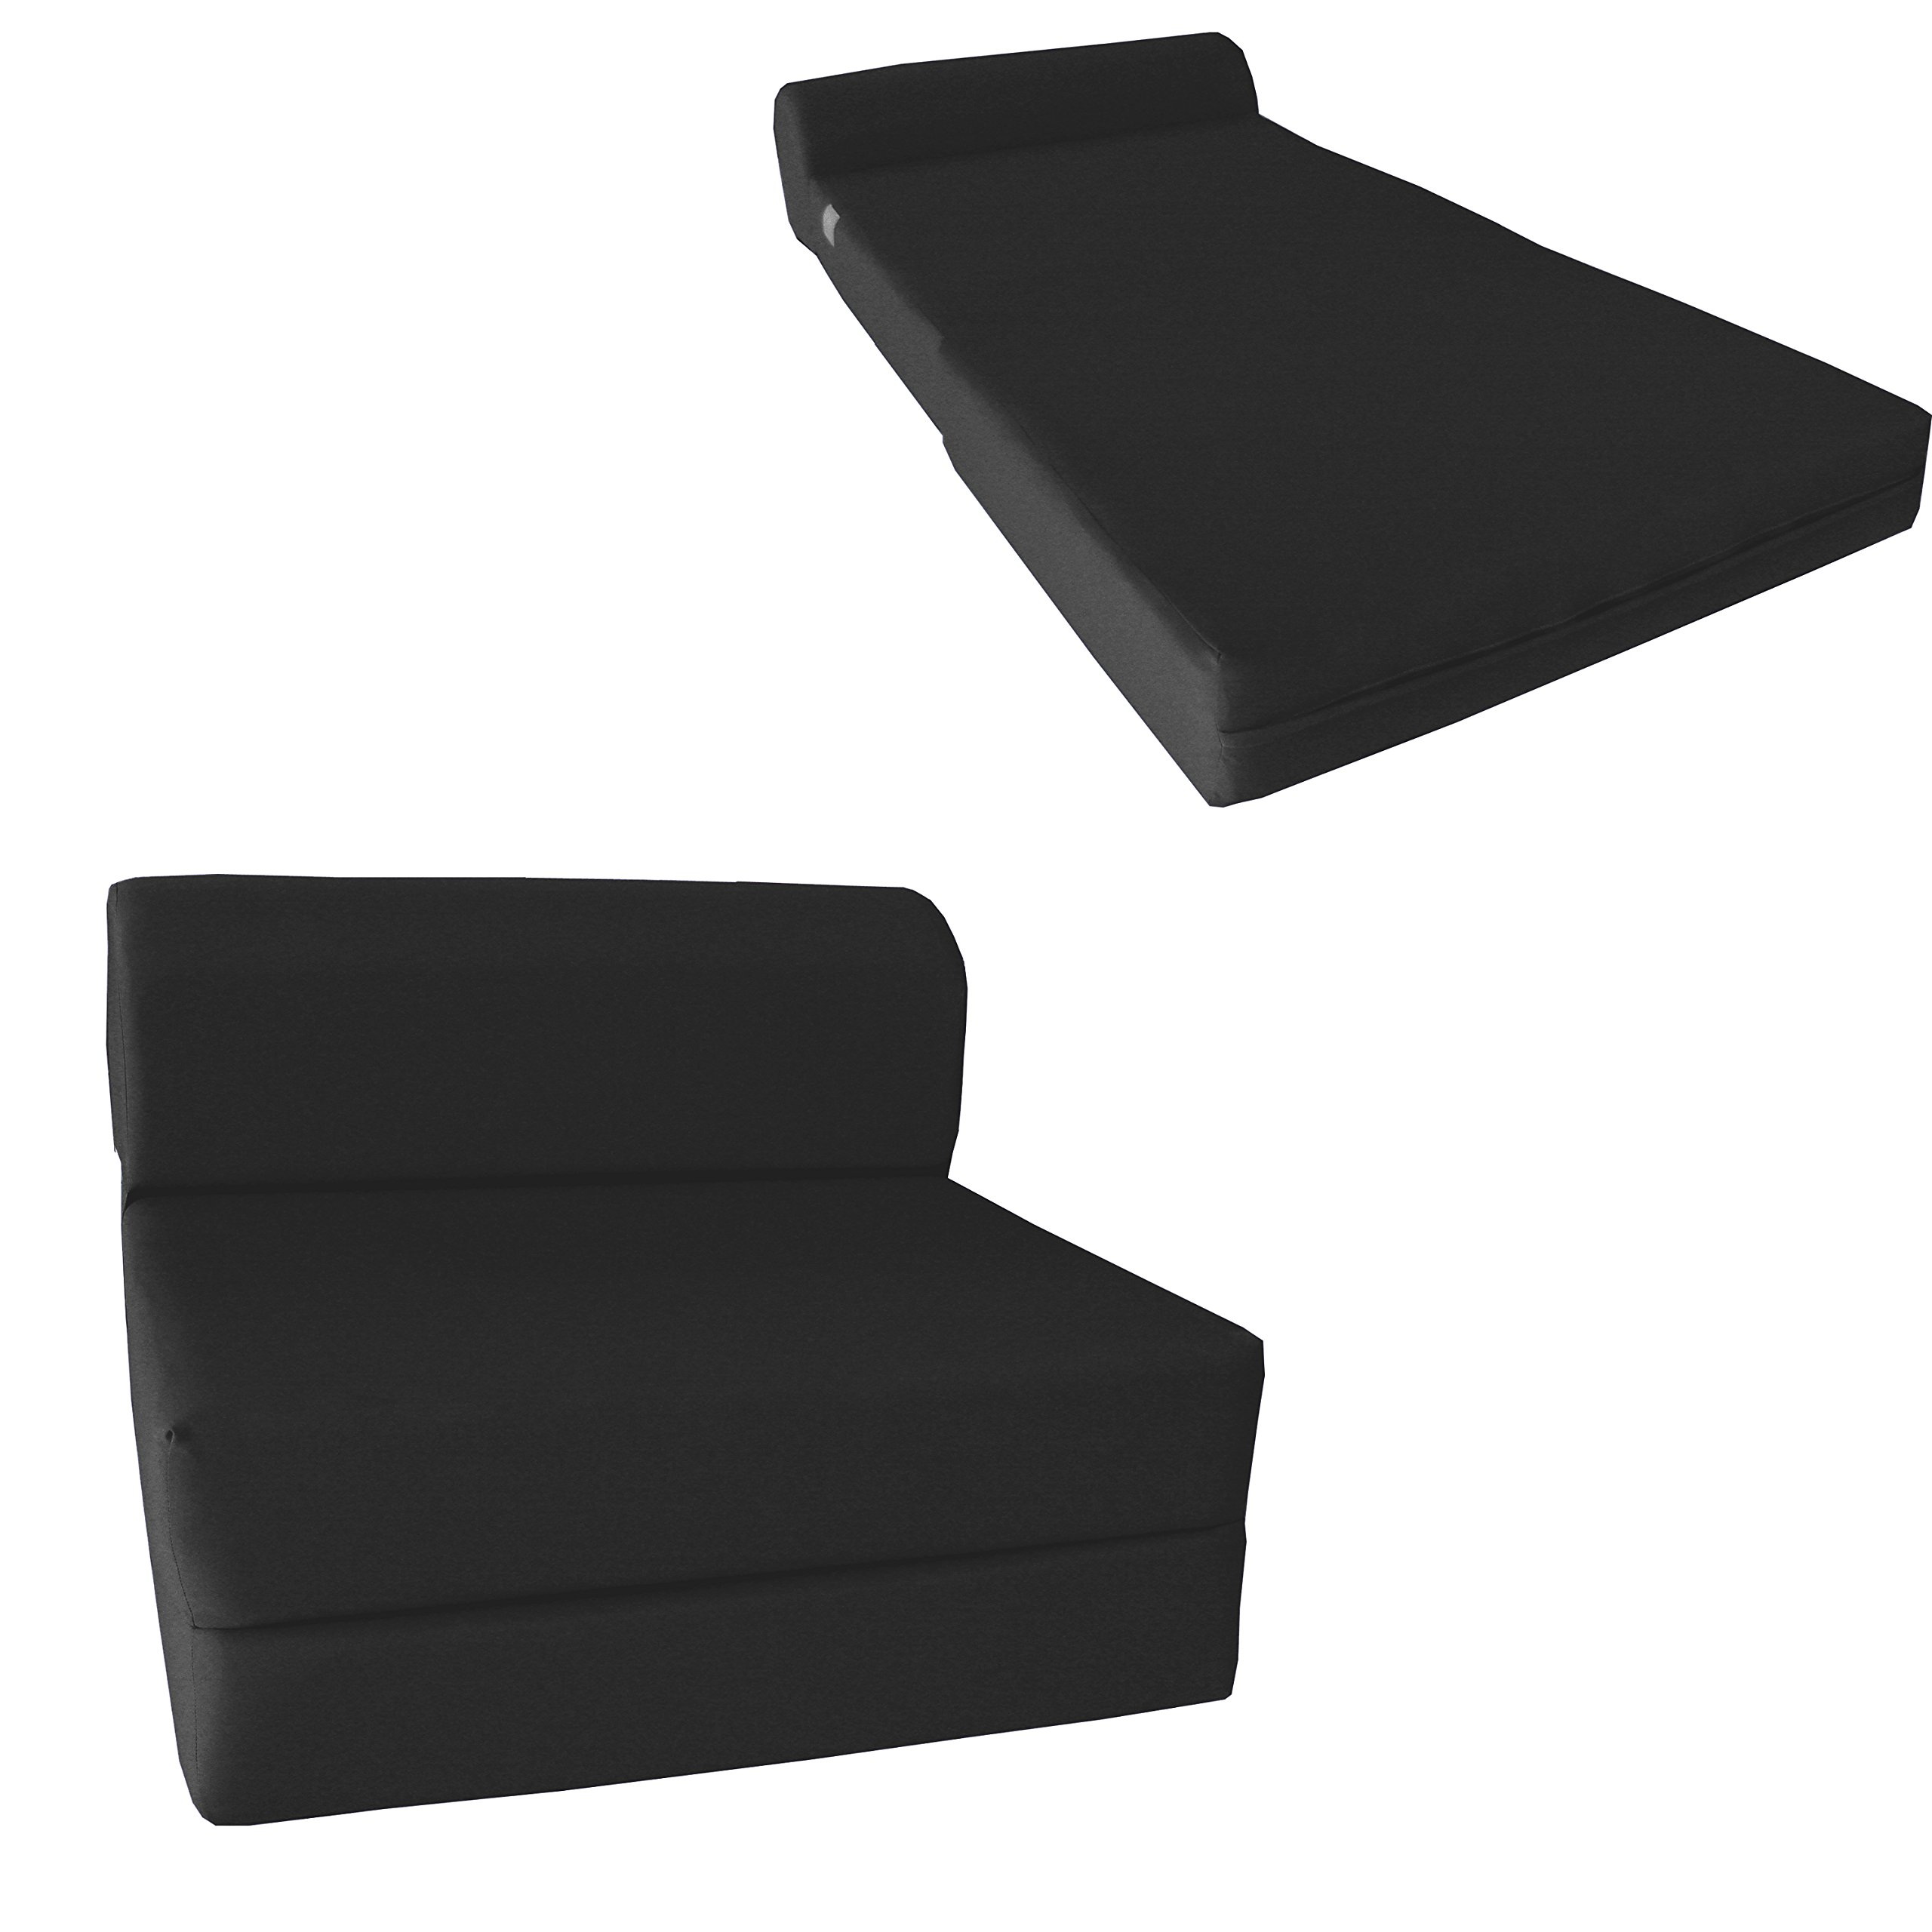 D&D Futon Furniture Chair Folding Foam Bed, Studio Sofa Guest Folded Foam Mattress (6'' x 48'' x 72'', Black) by D&D Futon Furniture.